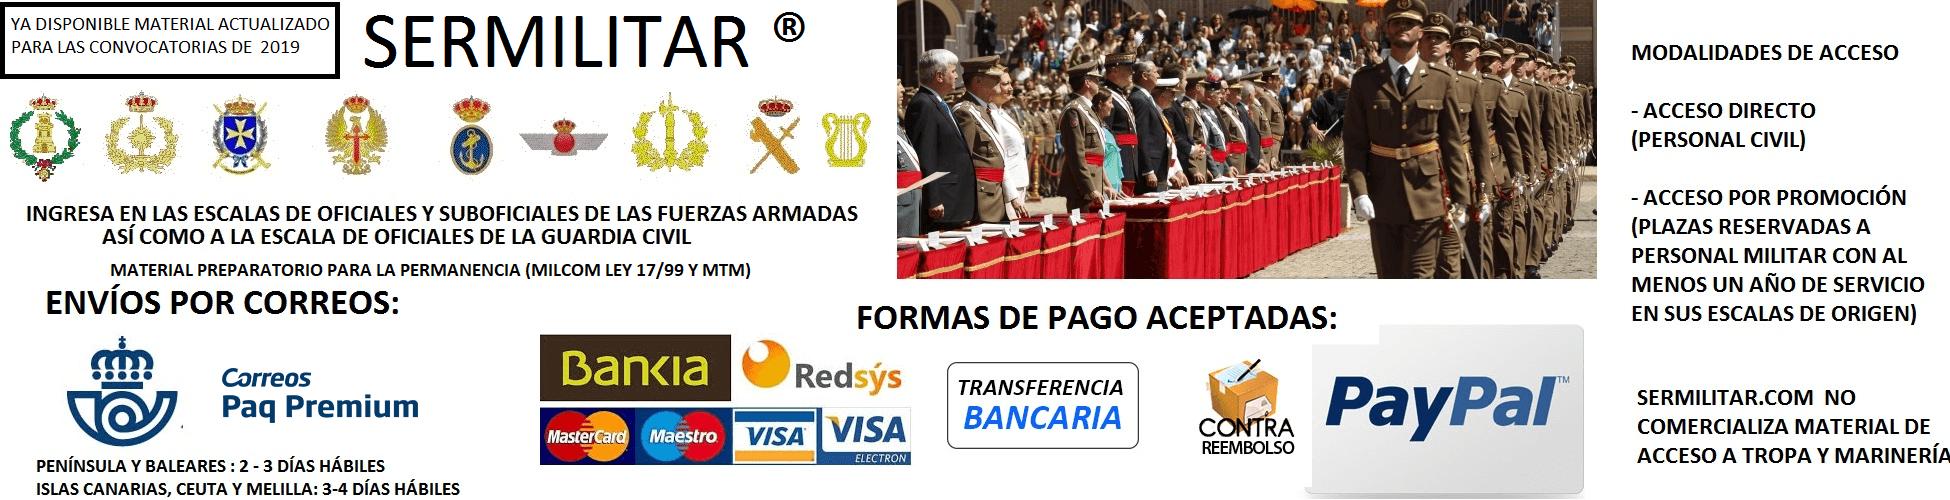 COMPRA SERMILITAR 2019